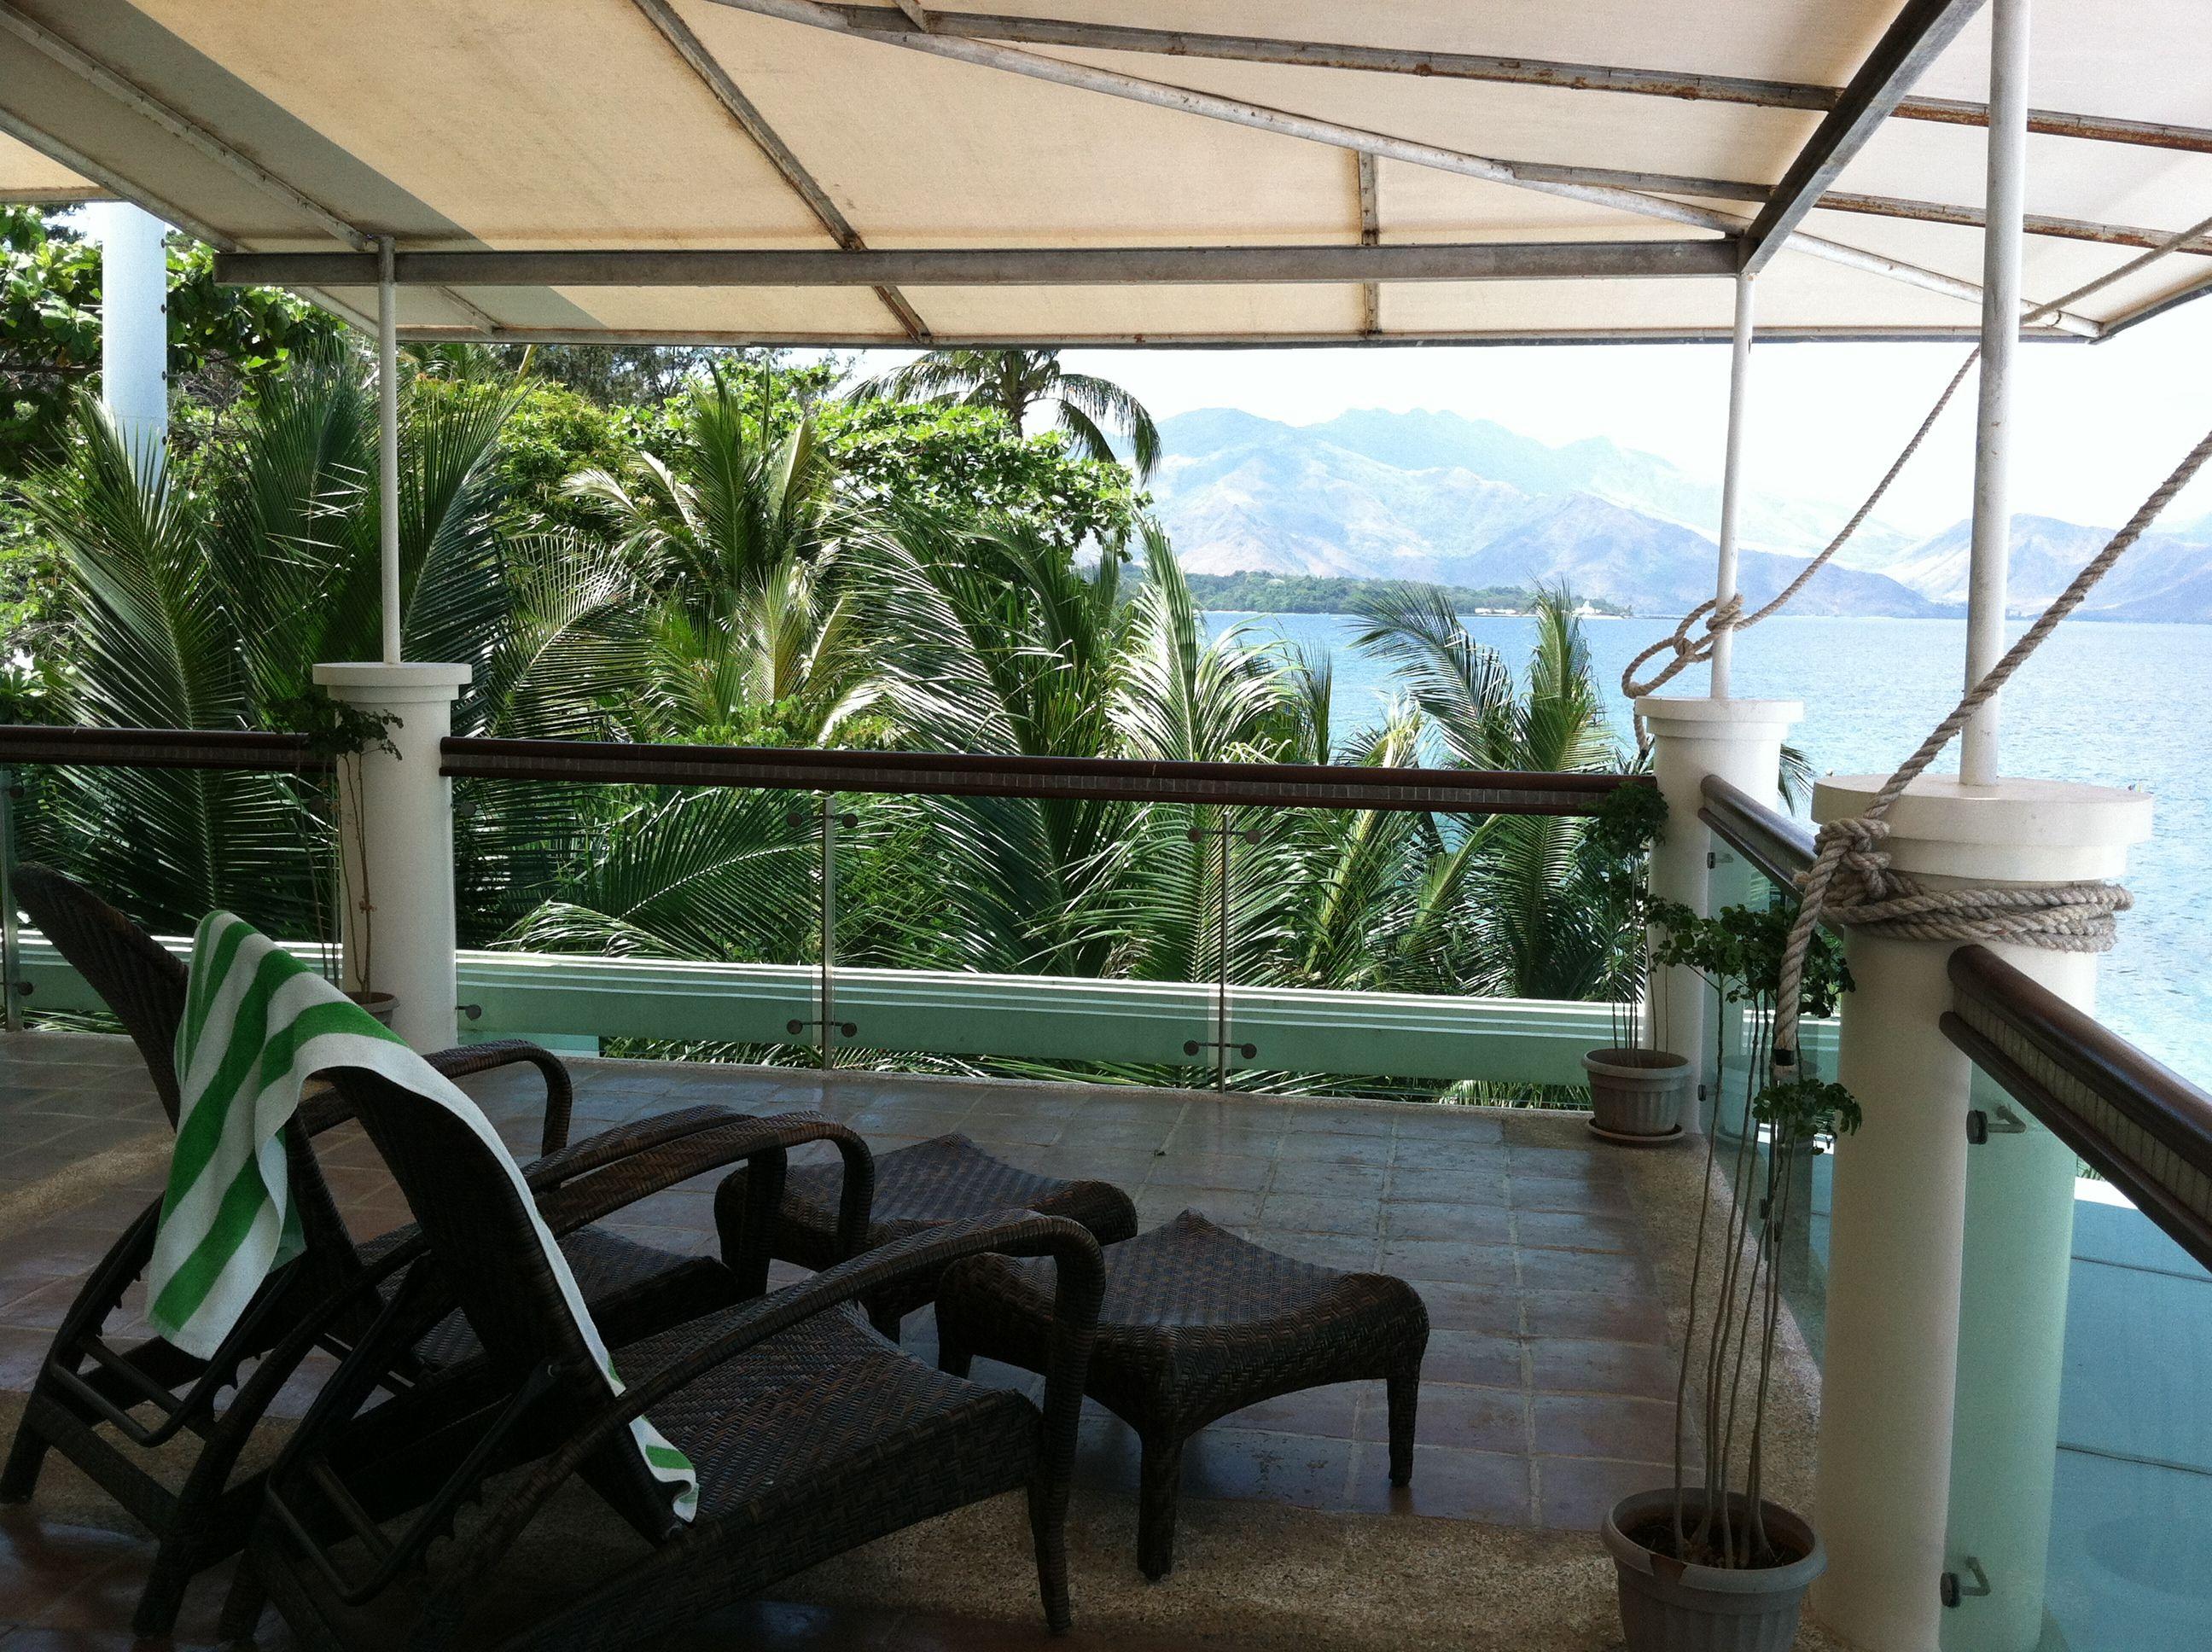 camayan-beach-resort-subic-bay | Adventure Time! | Pinterest | Subic ...